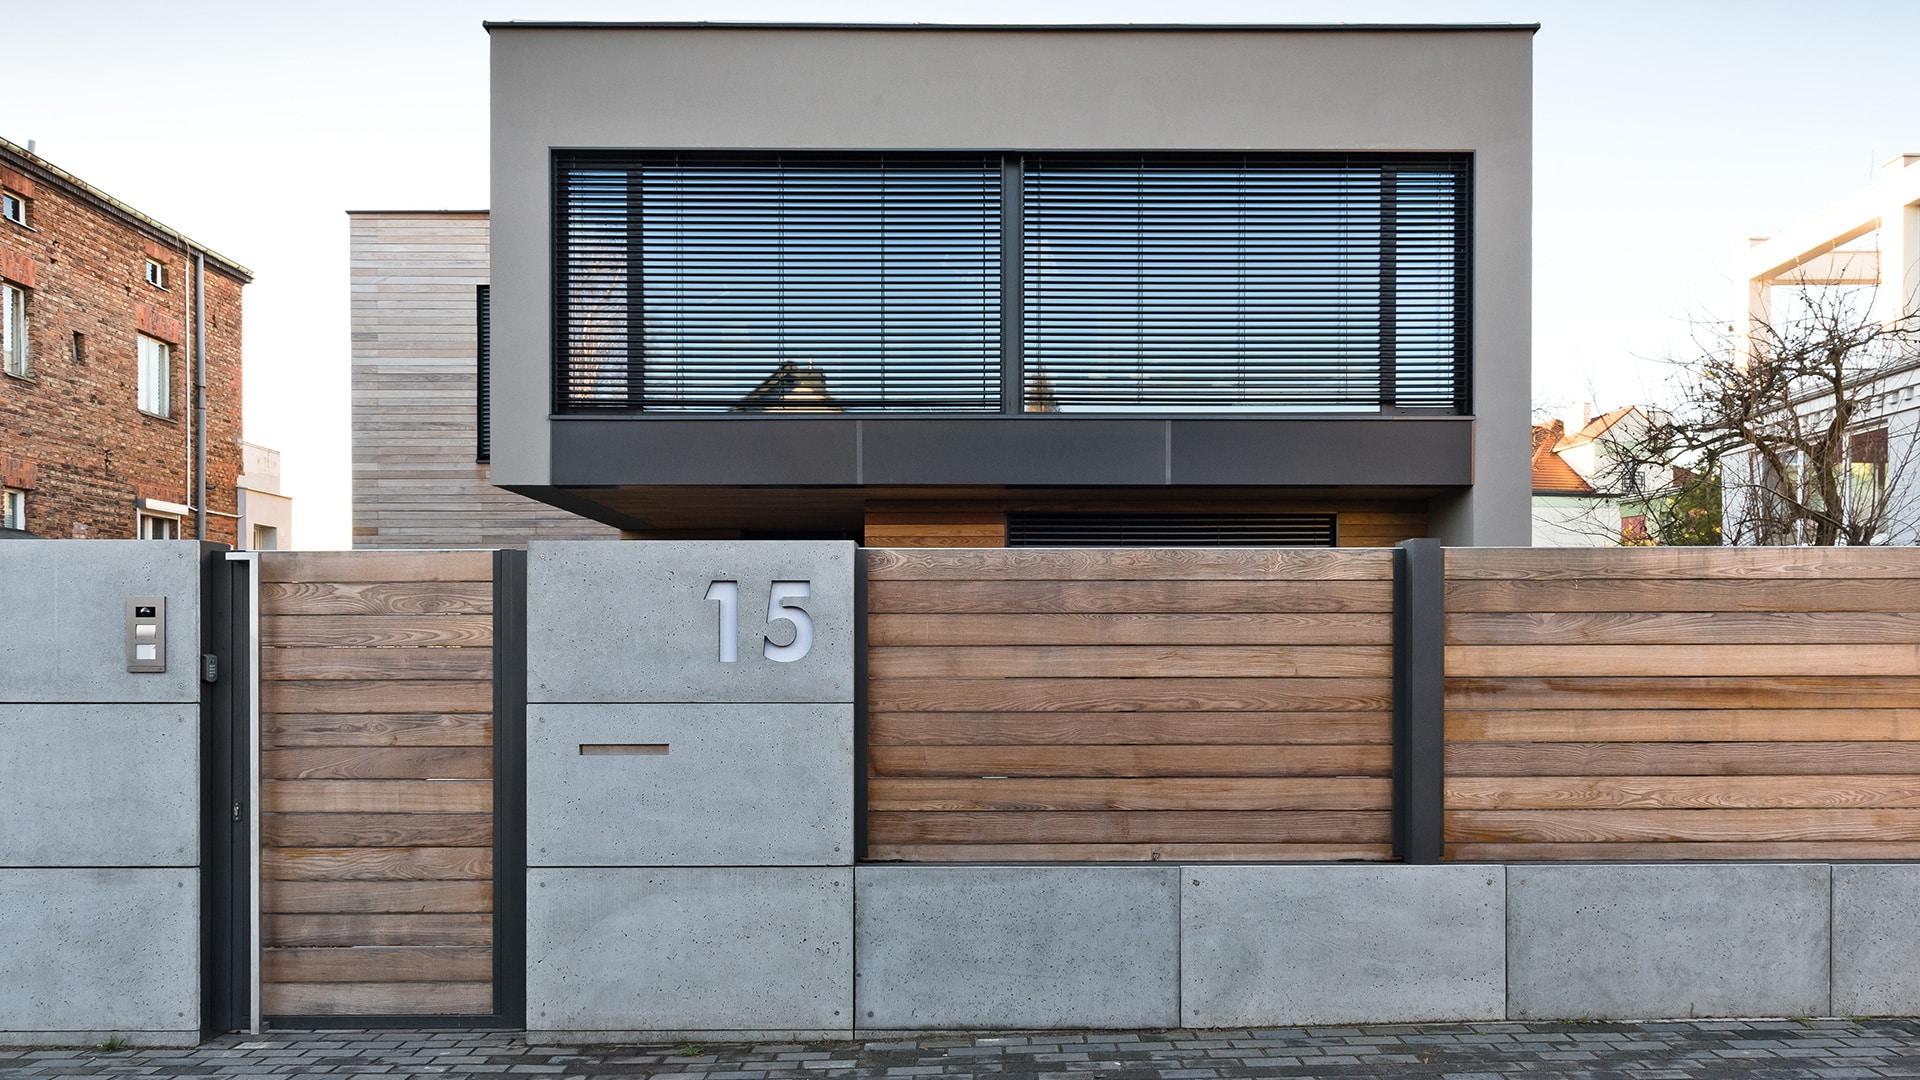 W Ultra Beton architektoniczny – wady i zalety BK38